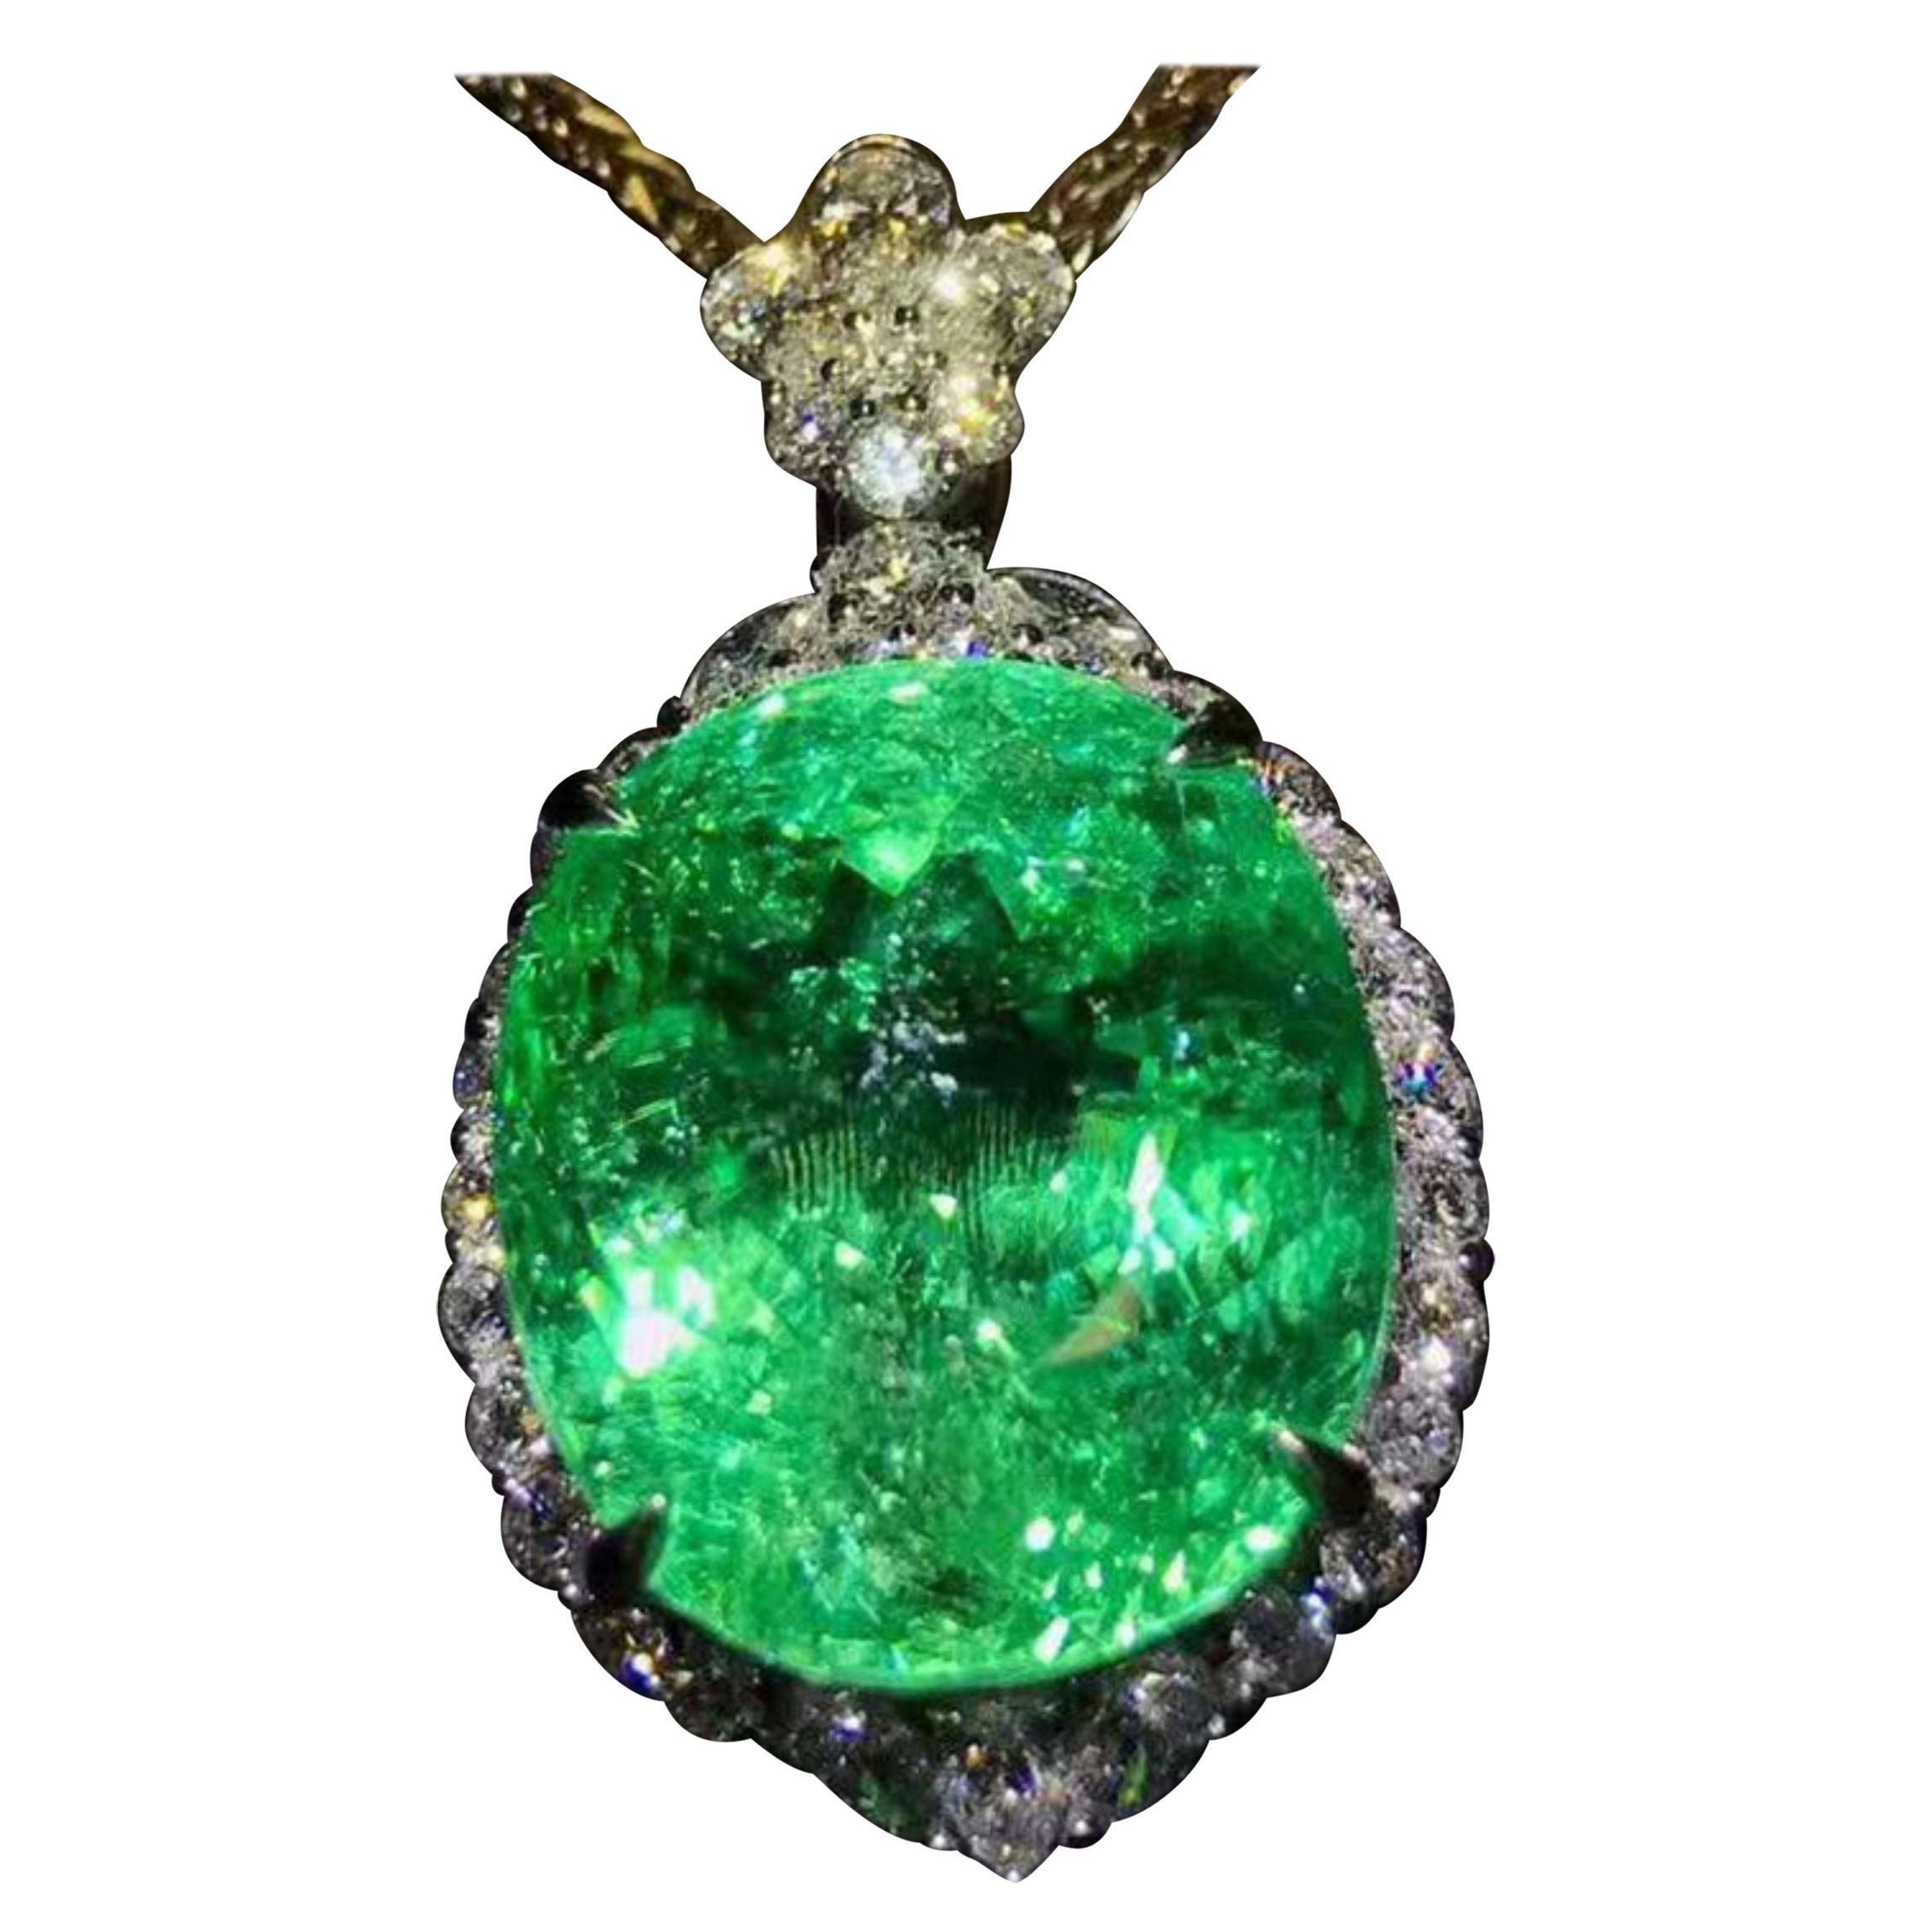 23.35 Carat Paraiba Tourmaline Diamond Necklace 18 Karat White Gold